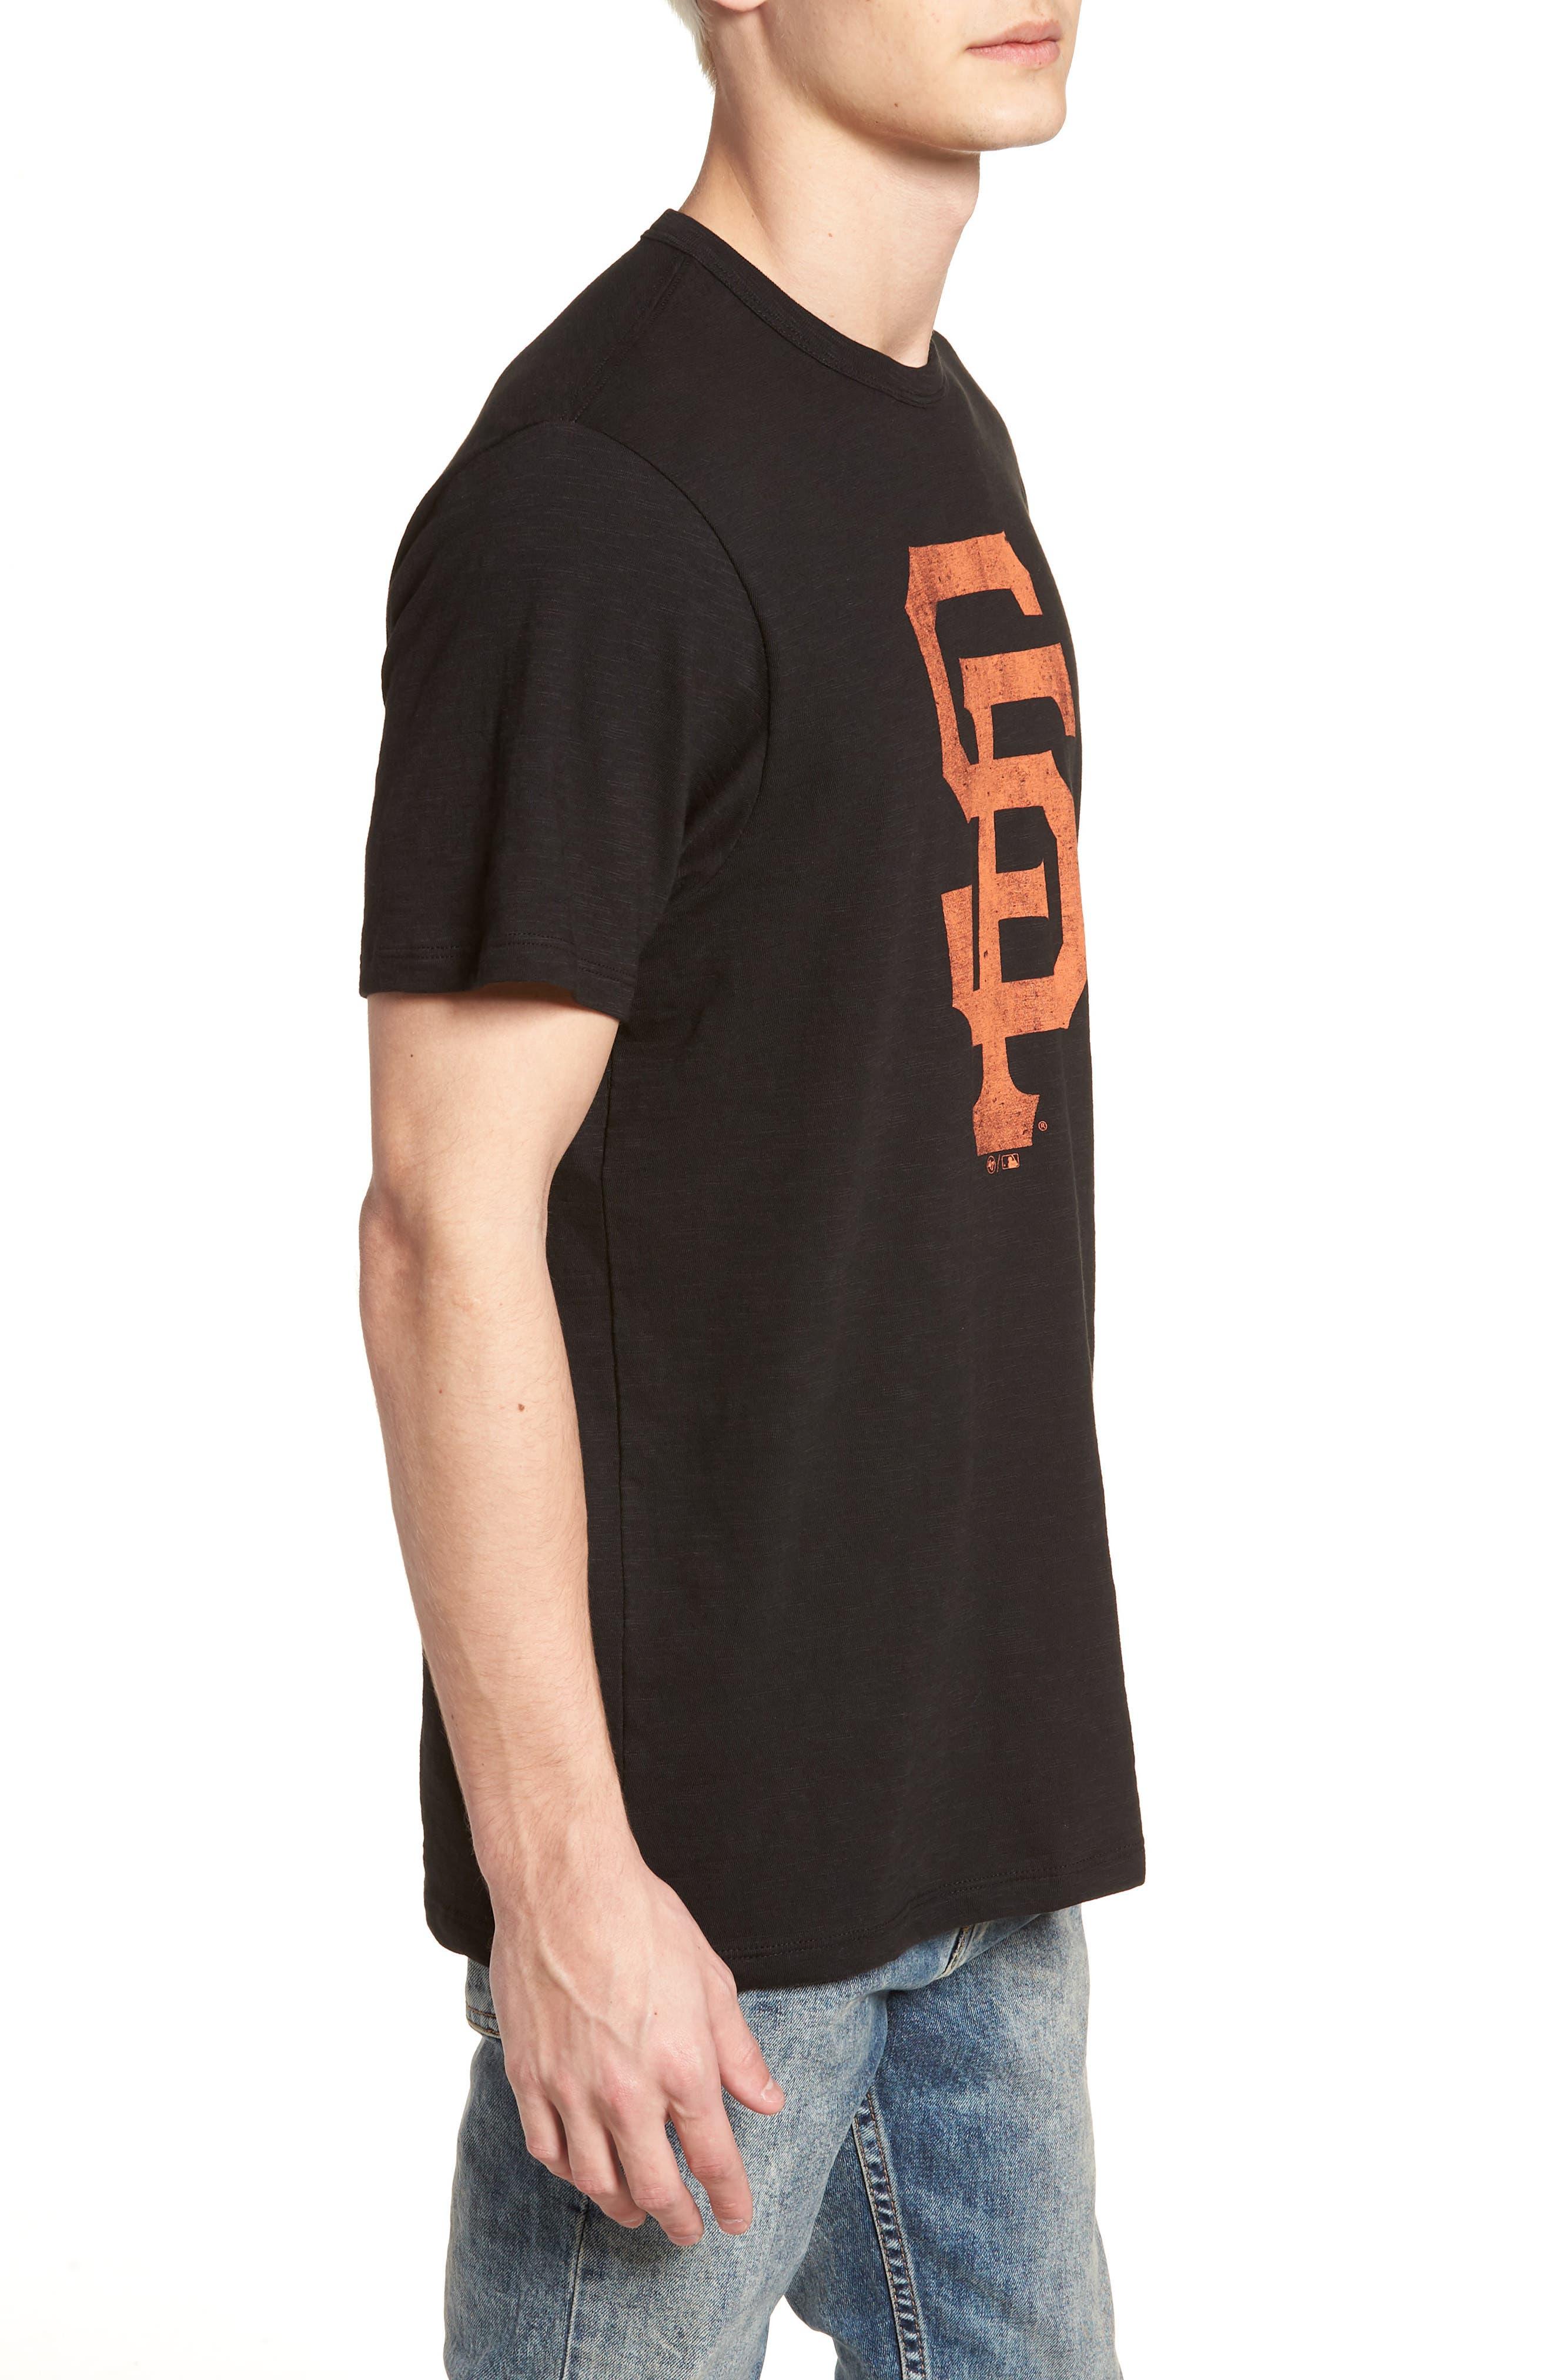 Grit Scrum San Francisco Giants T-Shirt,                             Alternate thumbnail 3, color,                             Jet Black